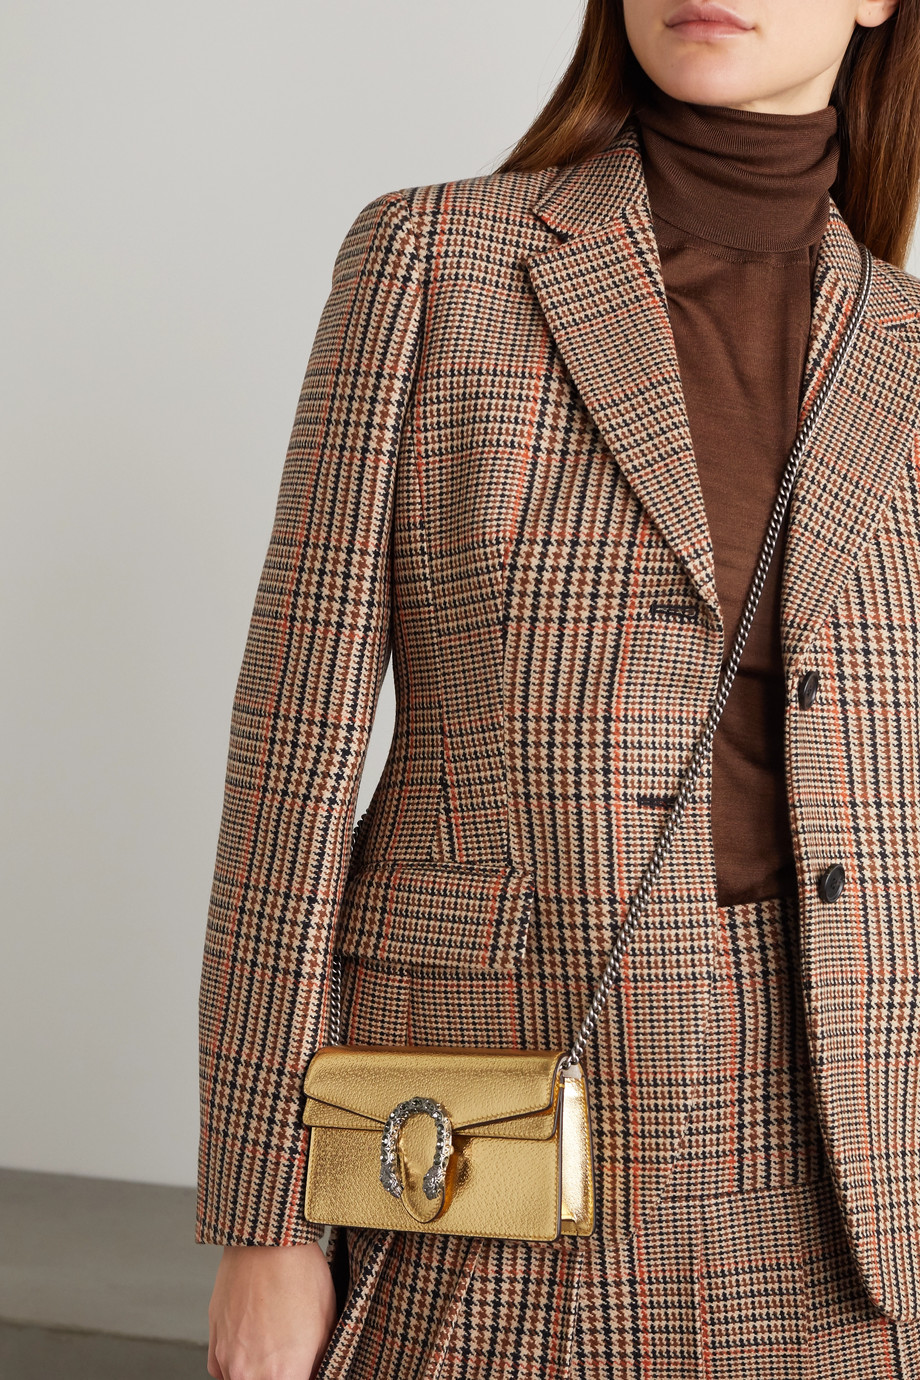 Gucci Dionysus 金属感皮革超迷你单肩包